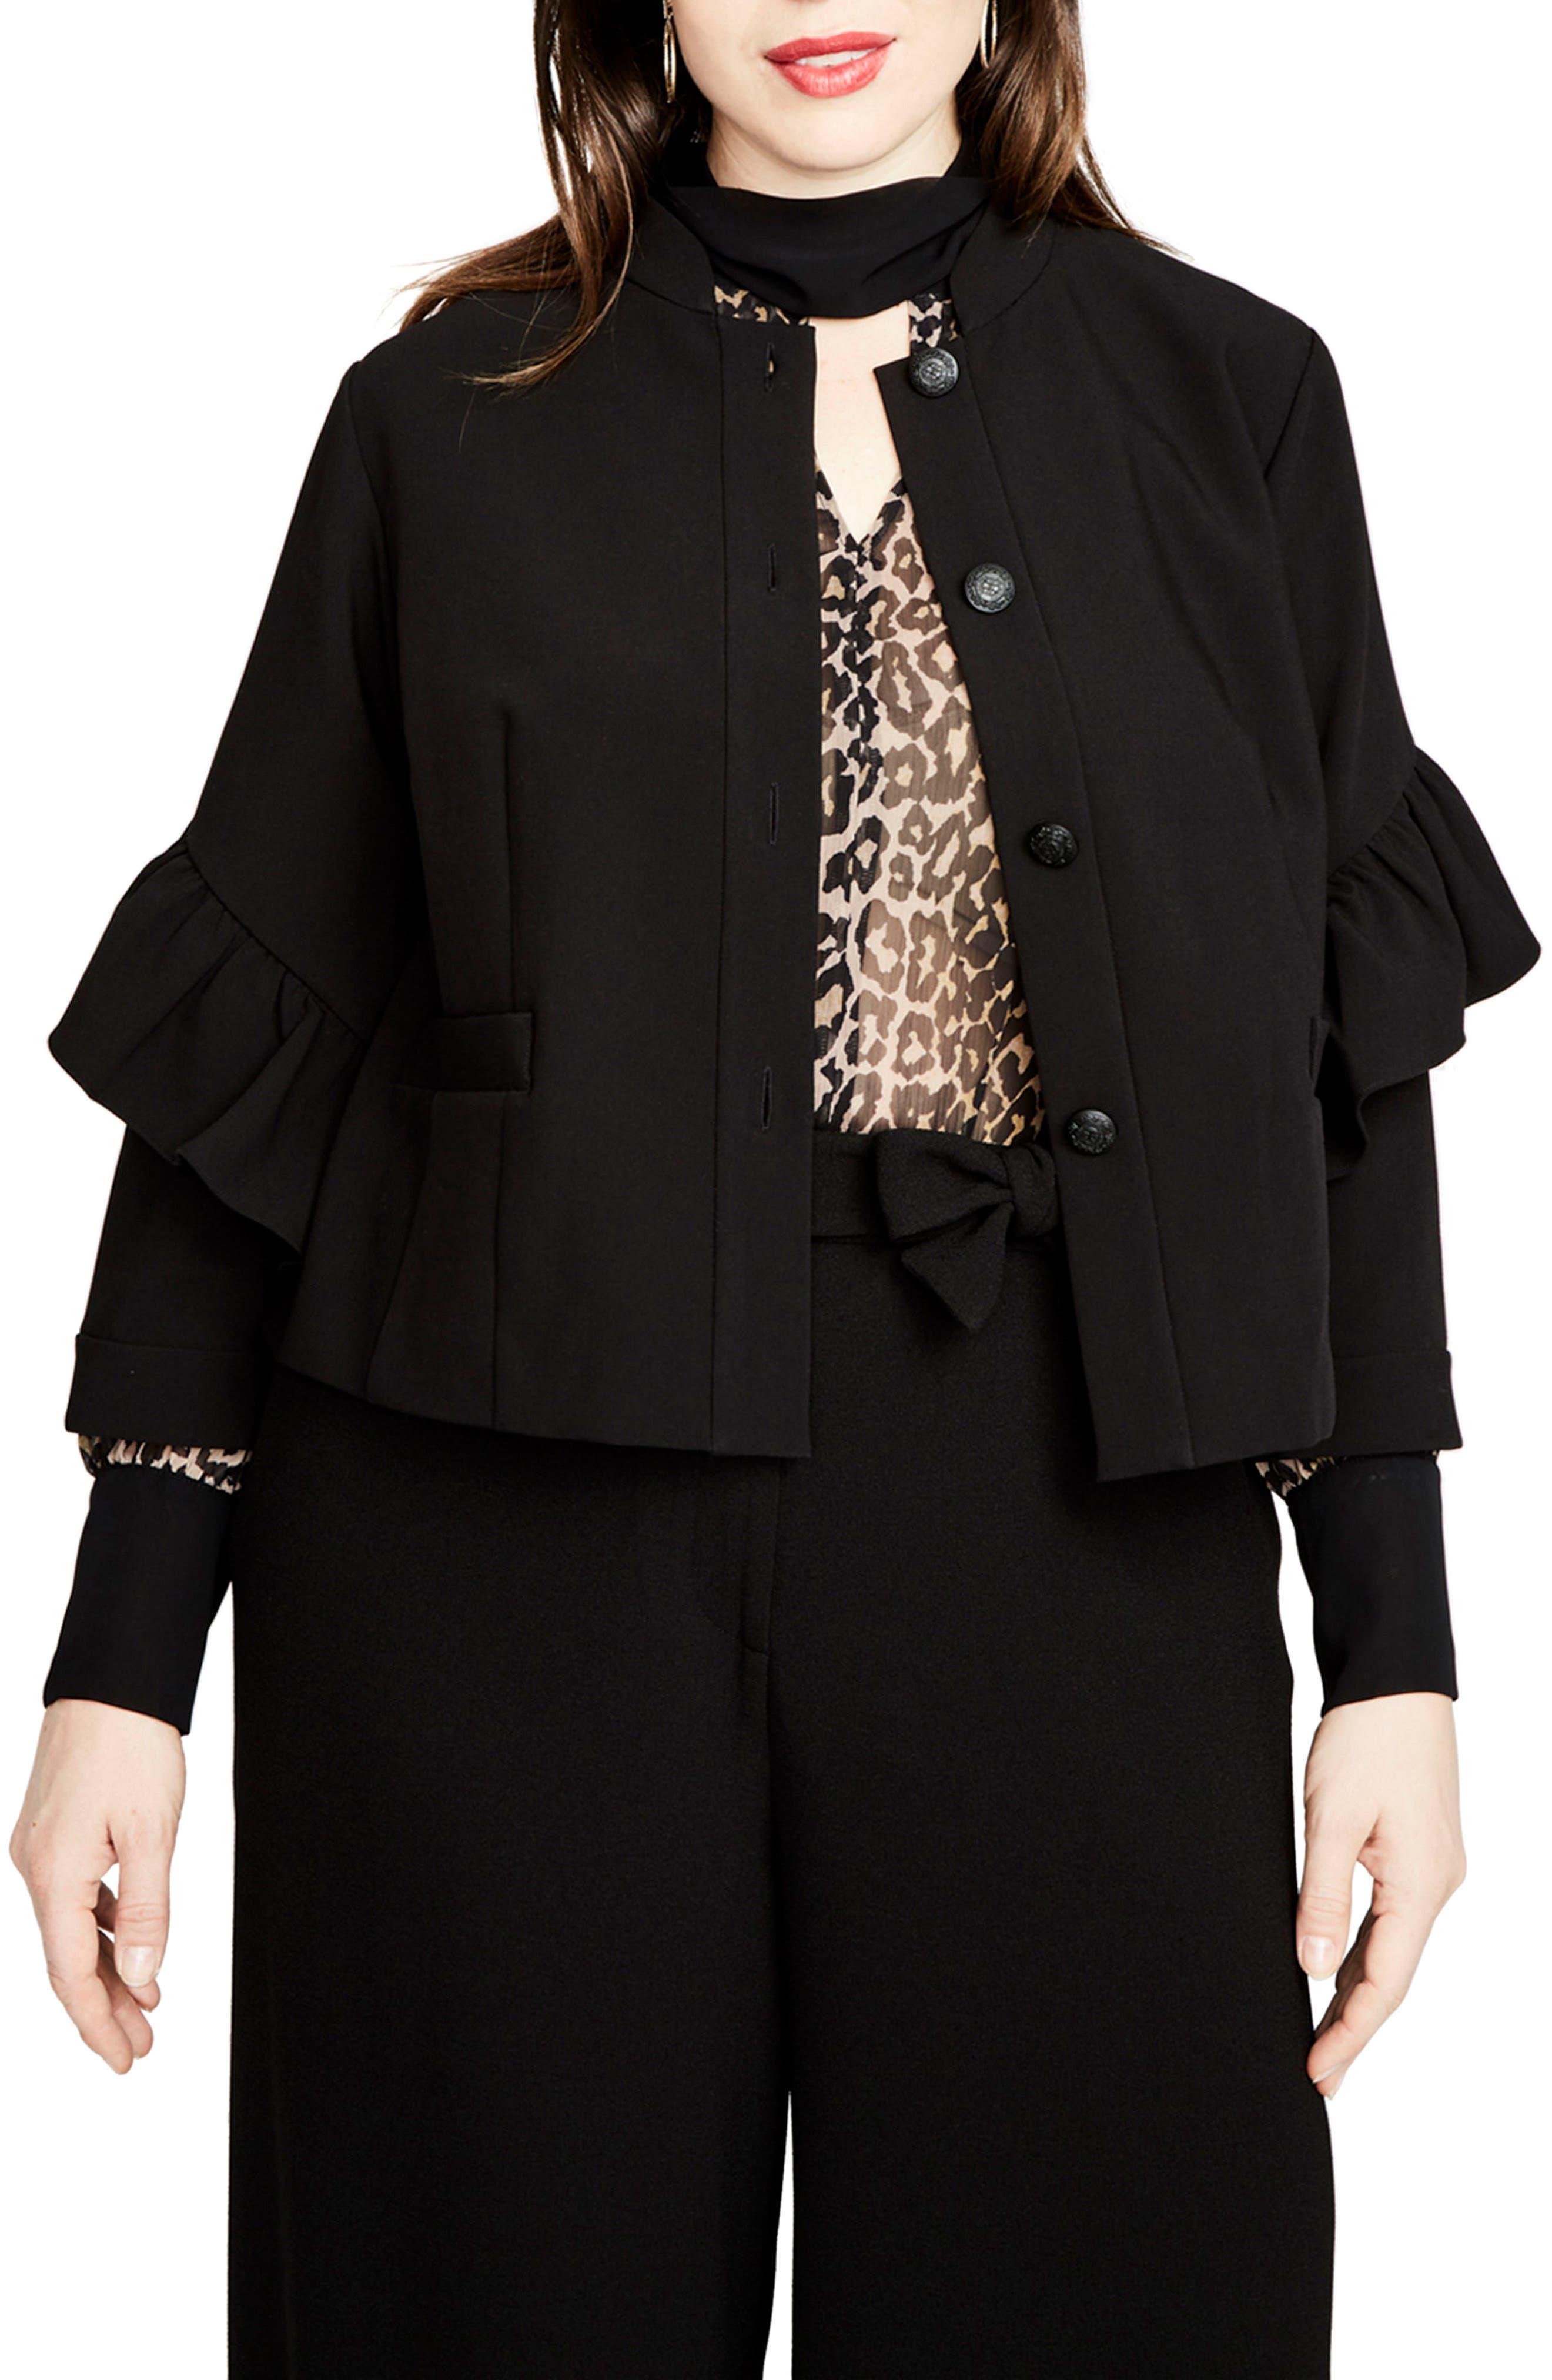 Ruffle Sleeve Jacket,                         Main,                         color, 001